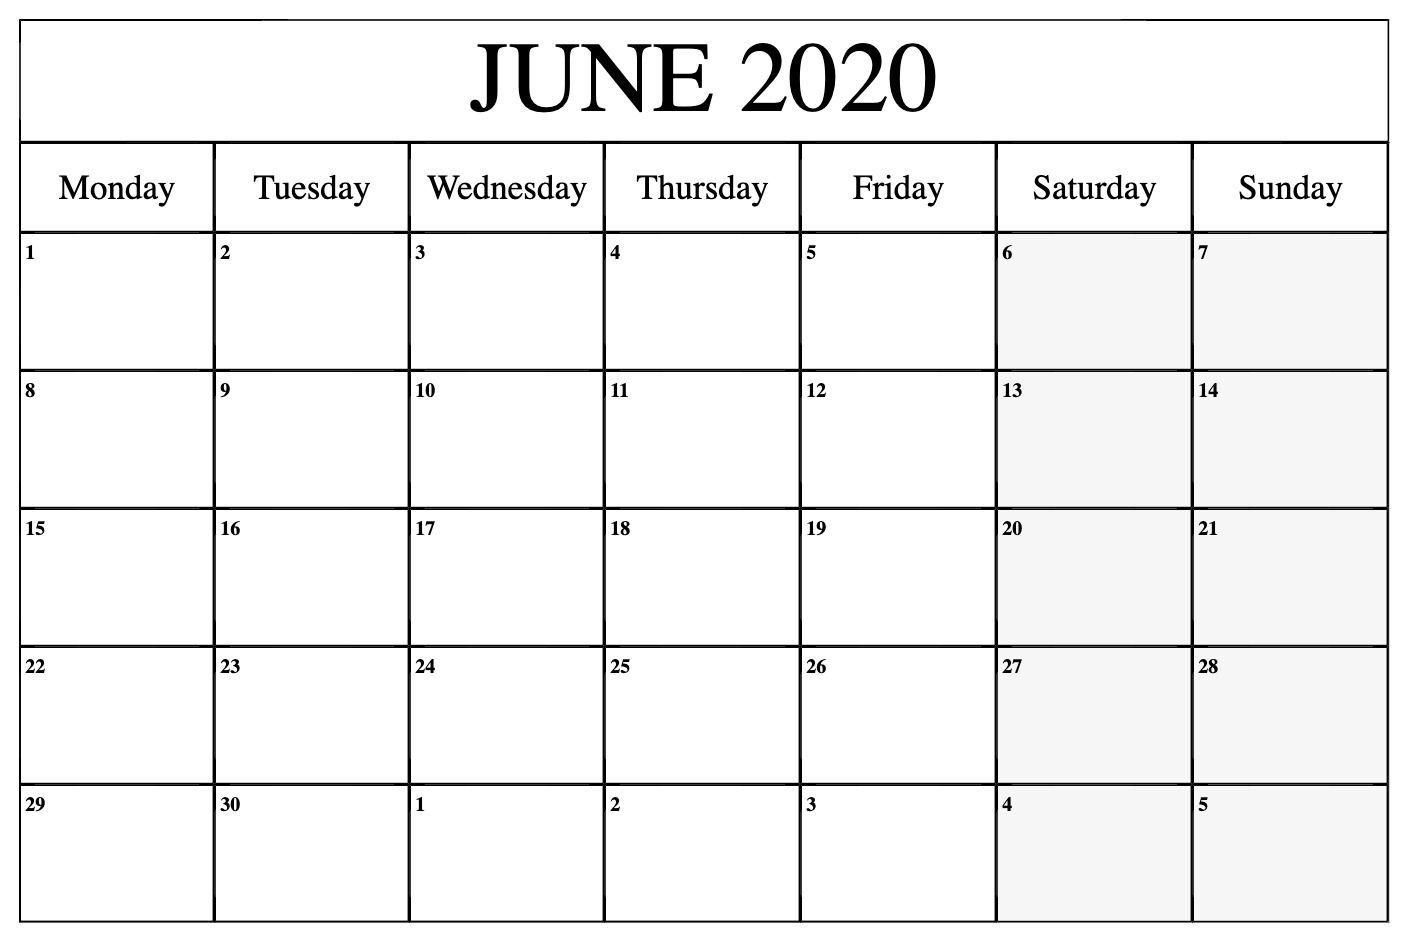 Free Editable June 2020 Calendar To Print Pdf Word Blank